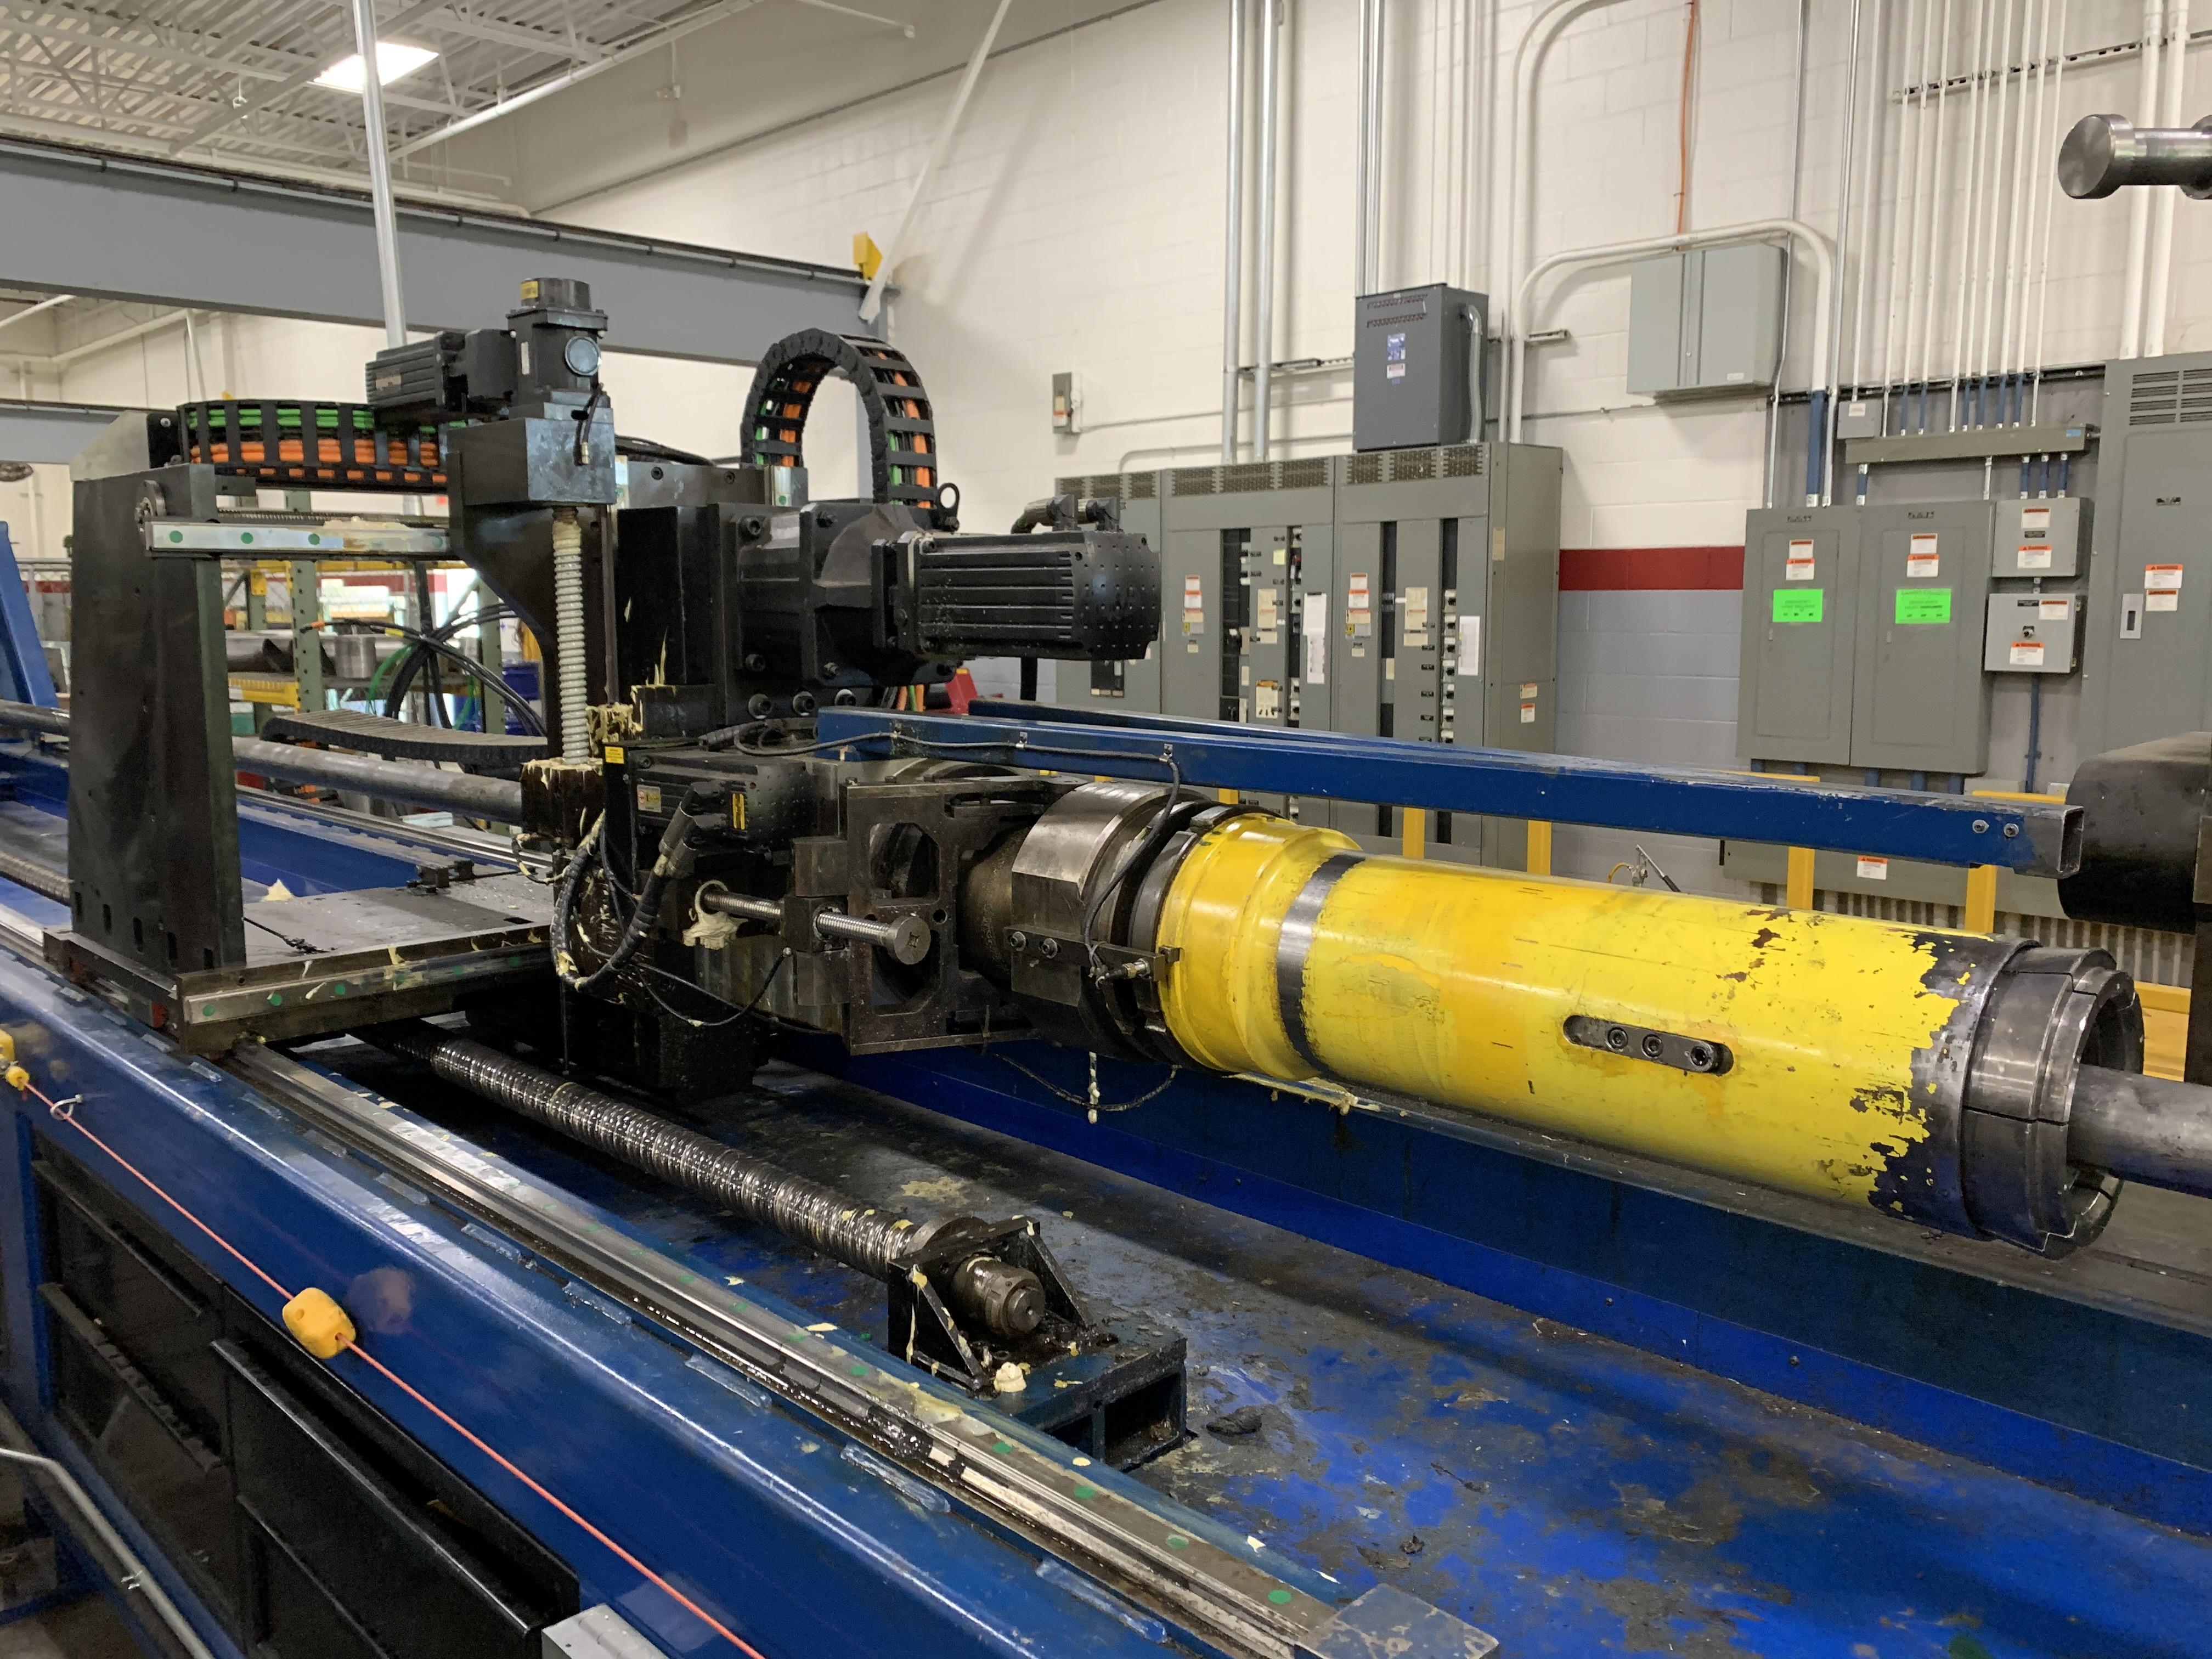 "6"" UNISON MODEL 6"" MS RH ELECTRIC CNC MULTI-STACK TUBE BENDER; S/N 2715, JOB NO. ME 4-410,(NEW 2014) - Image 17 of 72"